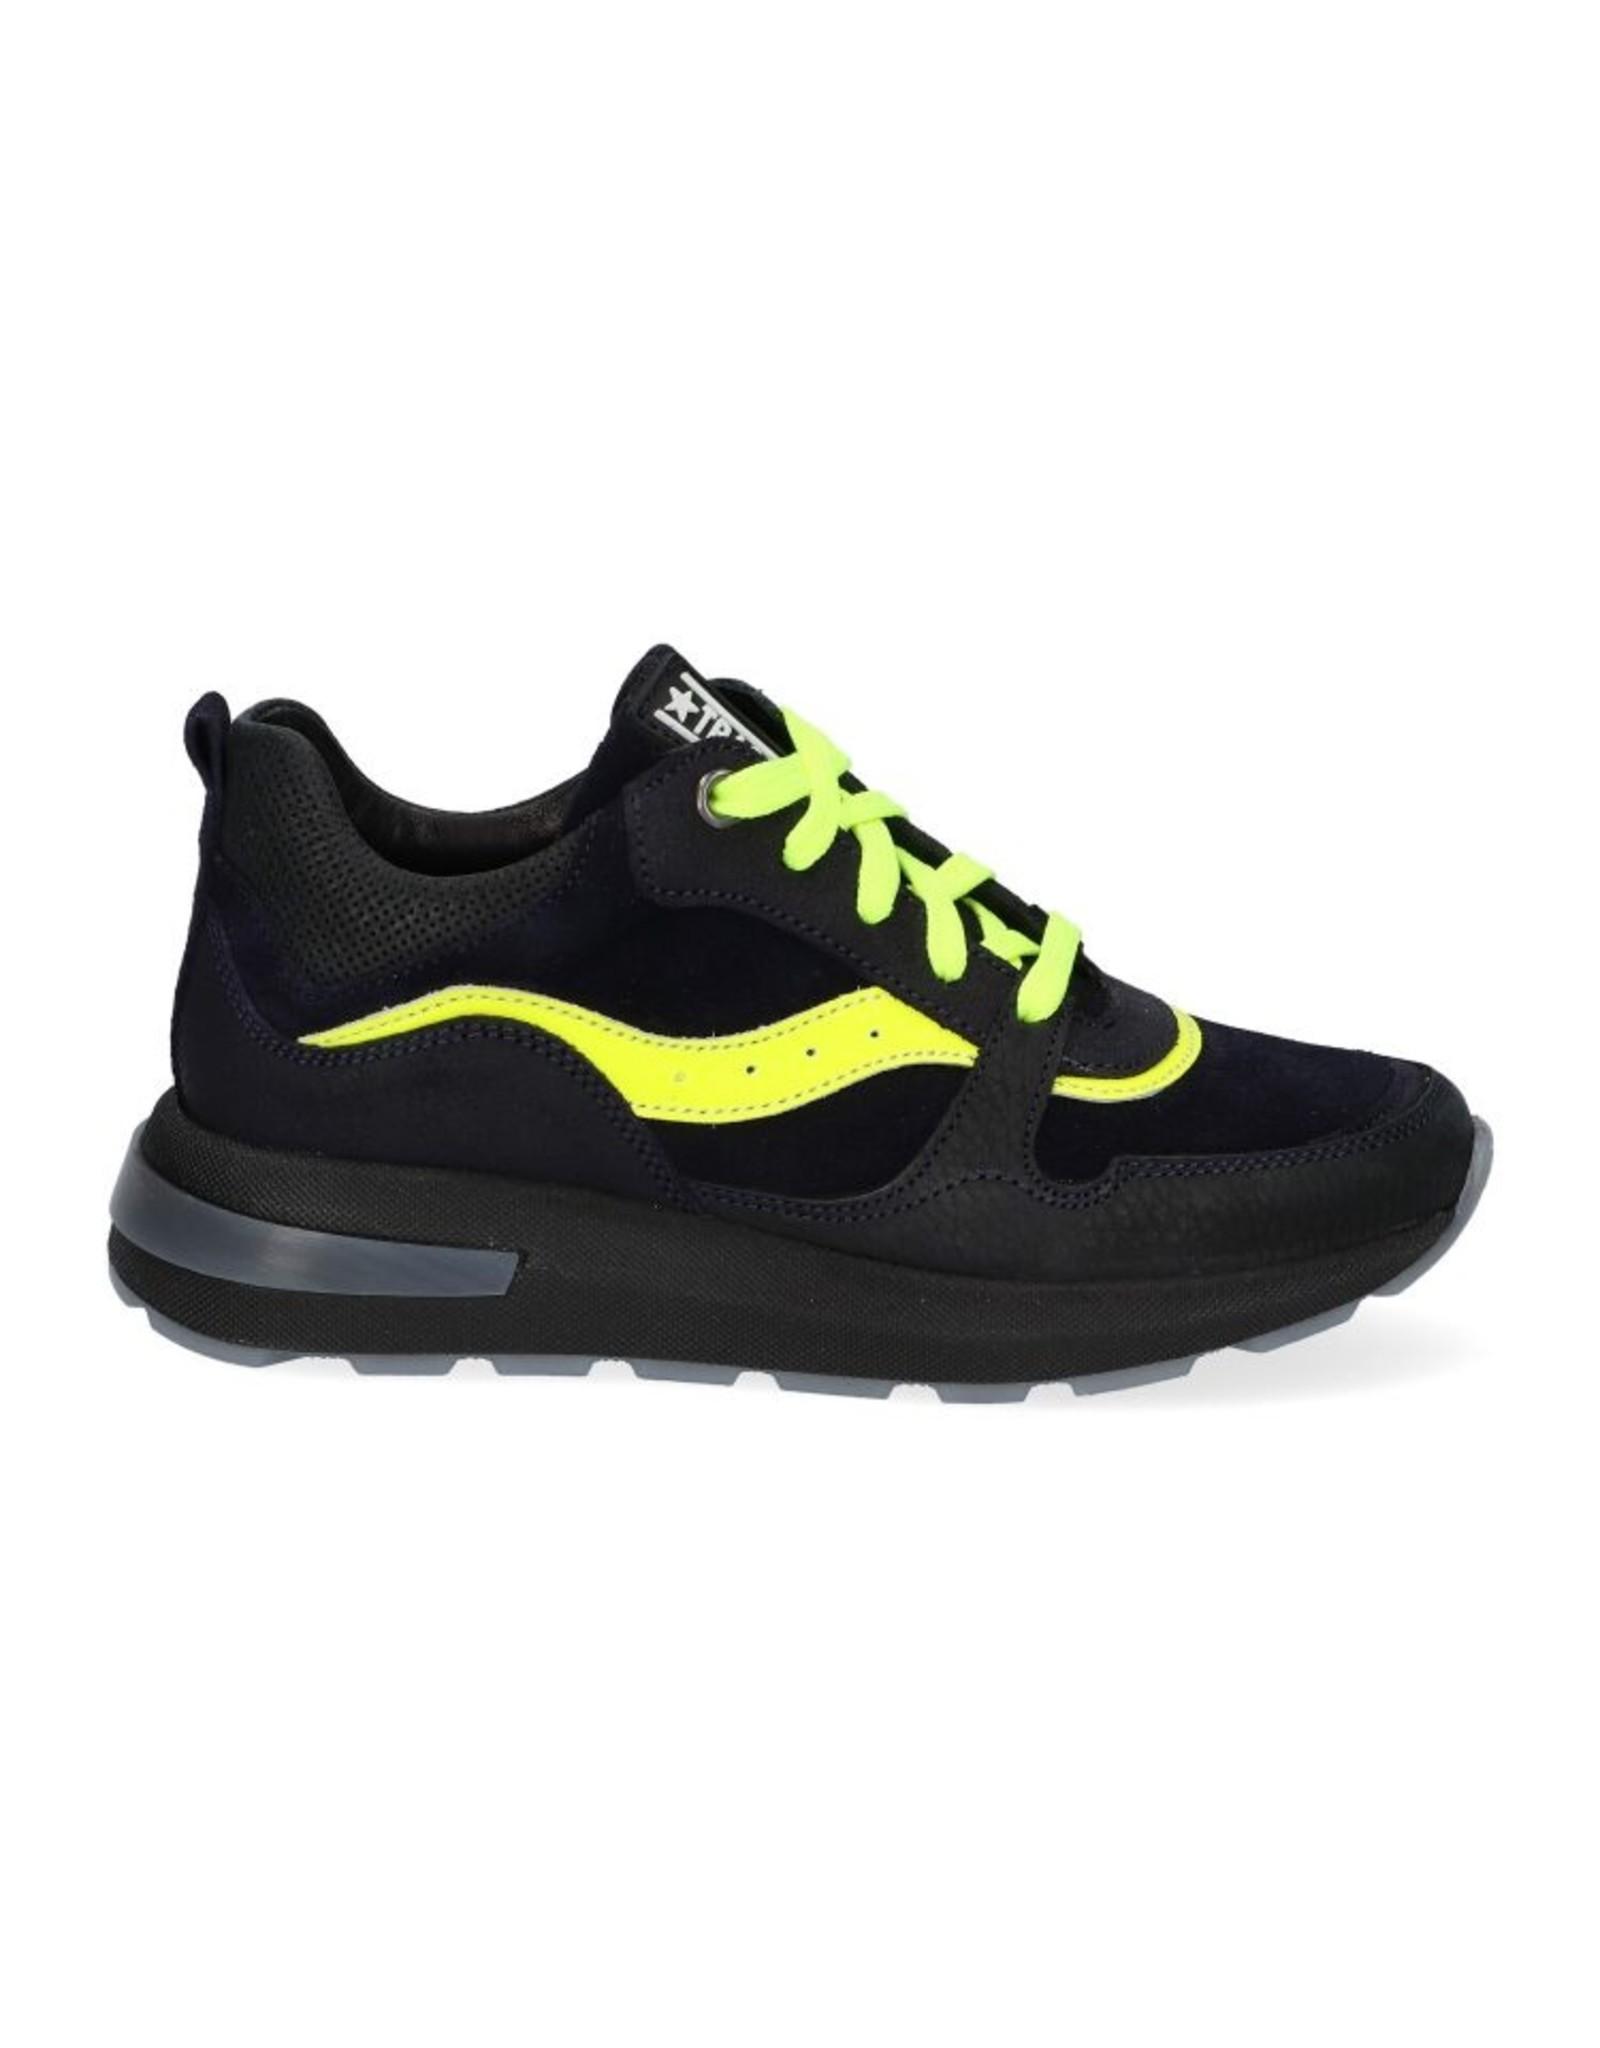 Track - Style Track-Style-Hoge-Klittenband-schoen